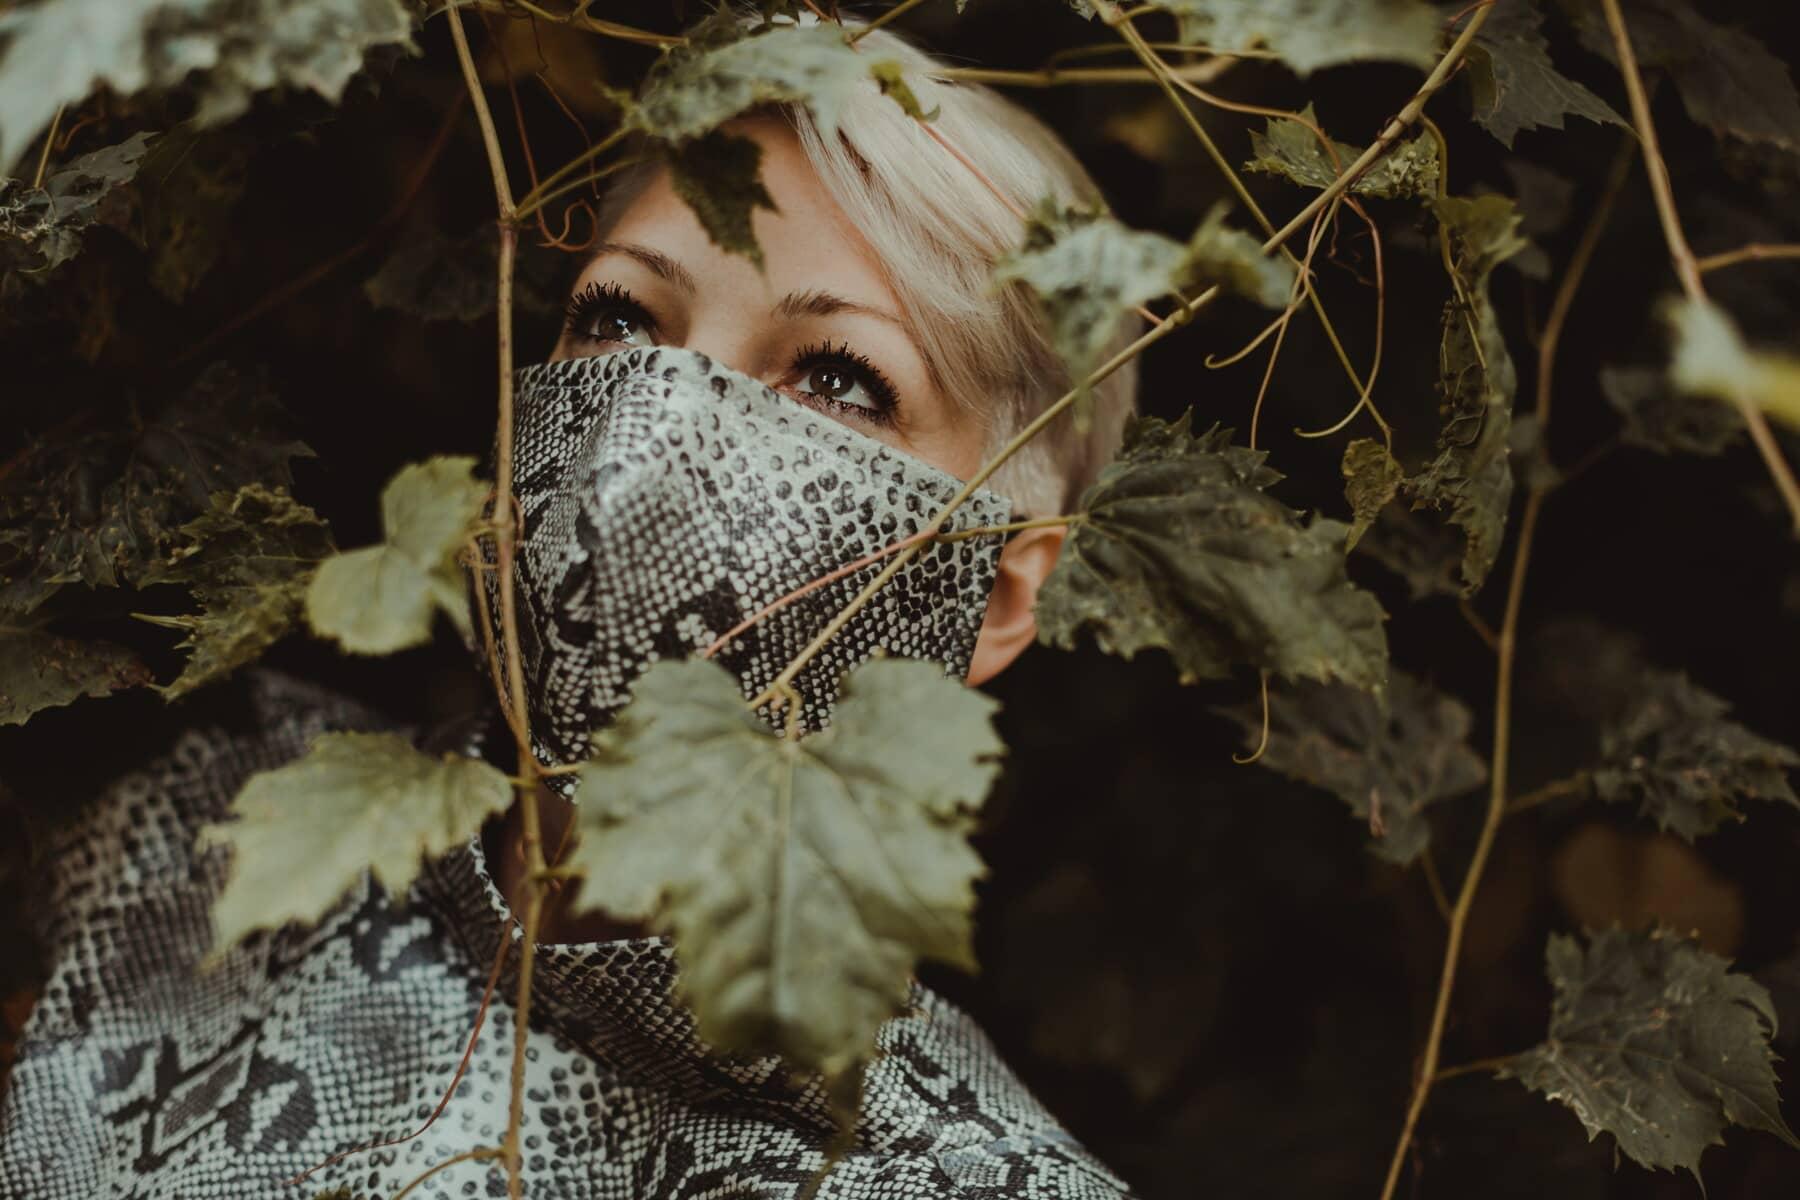 porträtt, lady, glamour, stil, mode, ansiktsmask, moderna, blad, personer, mörk